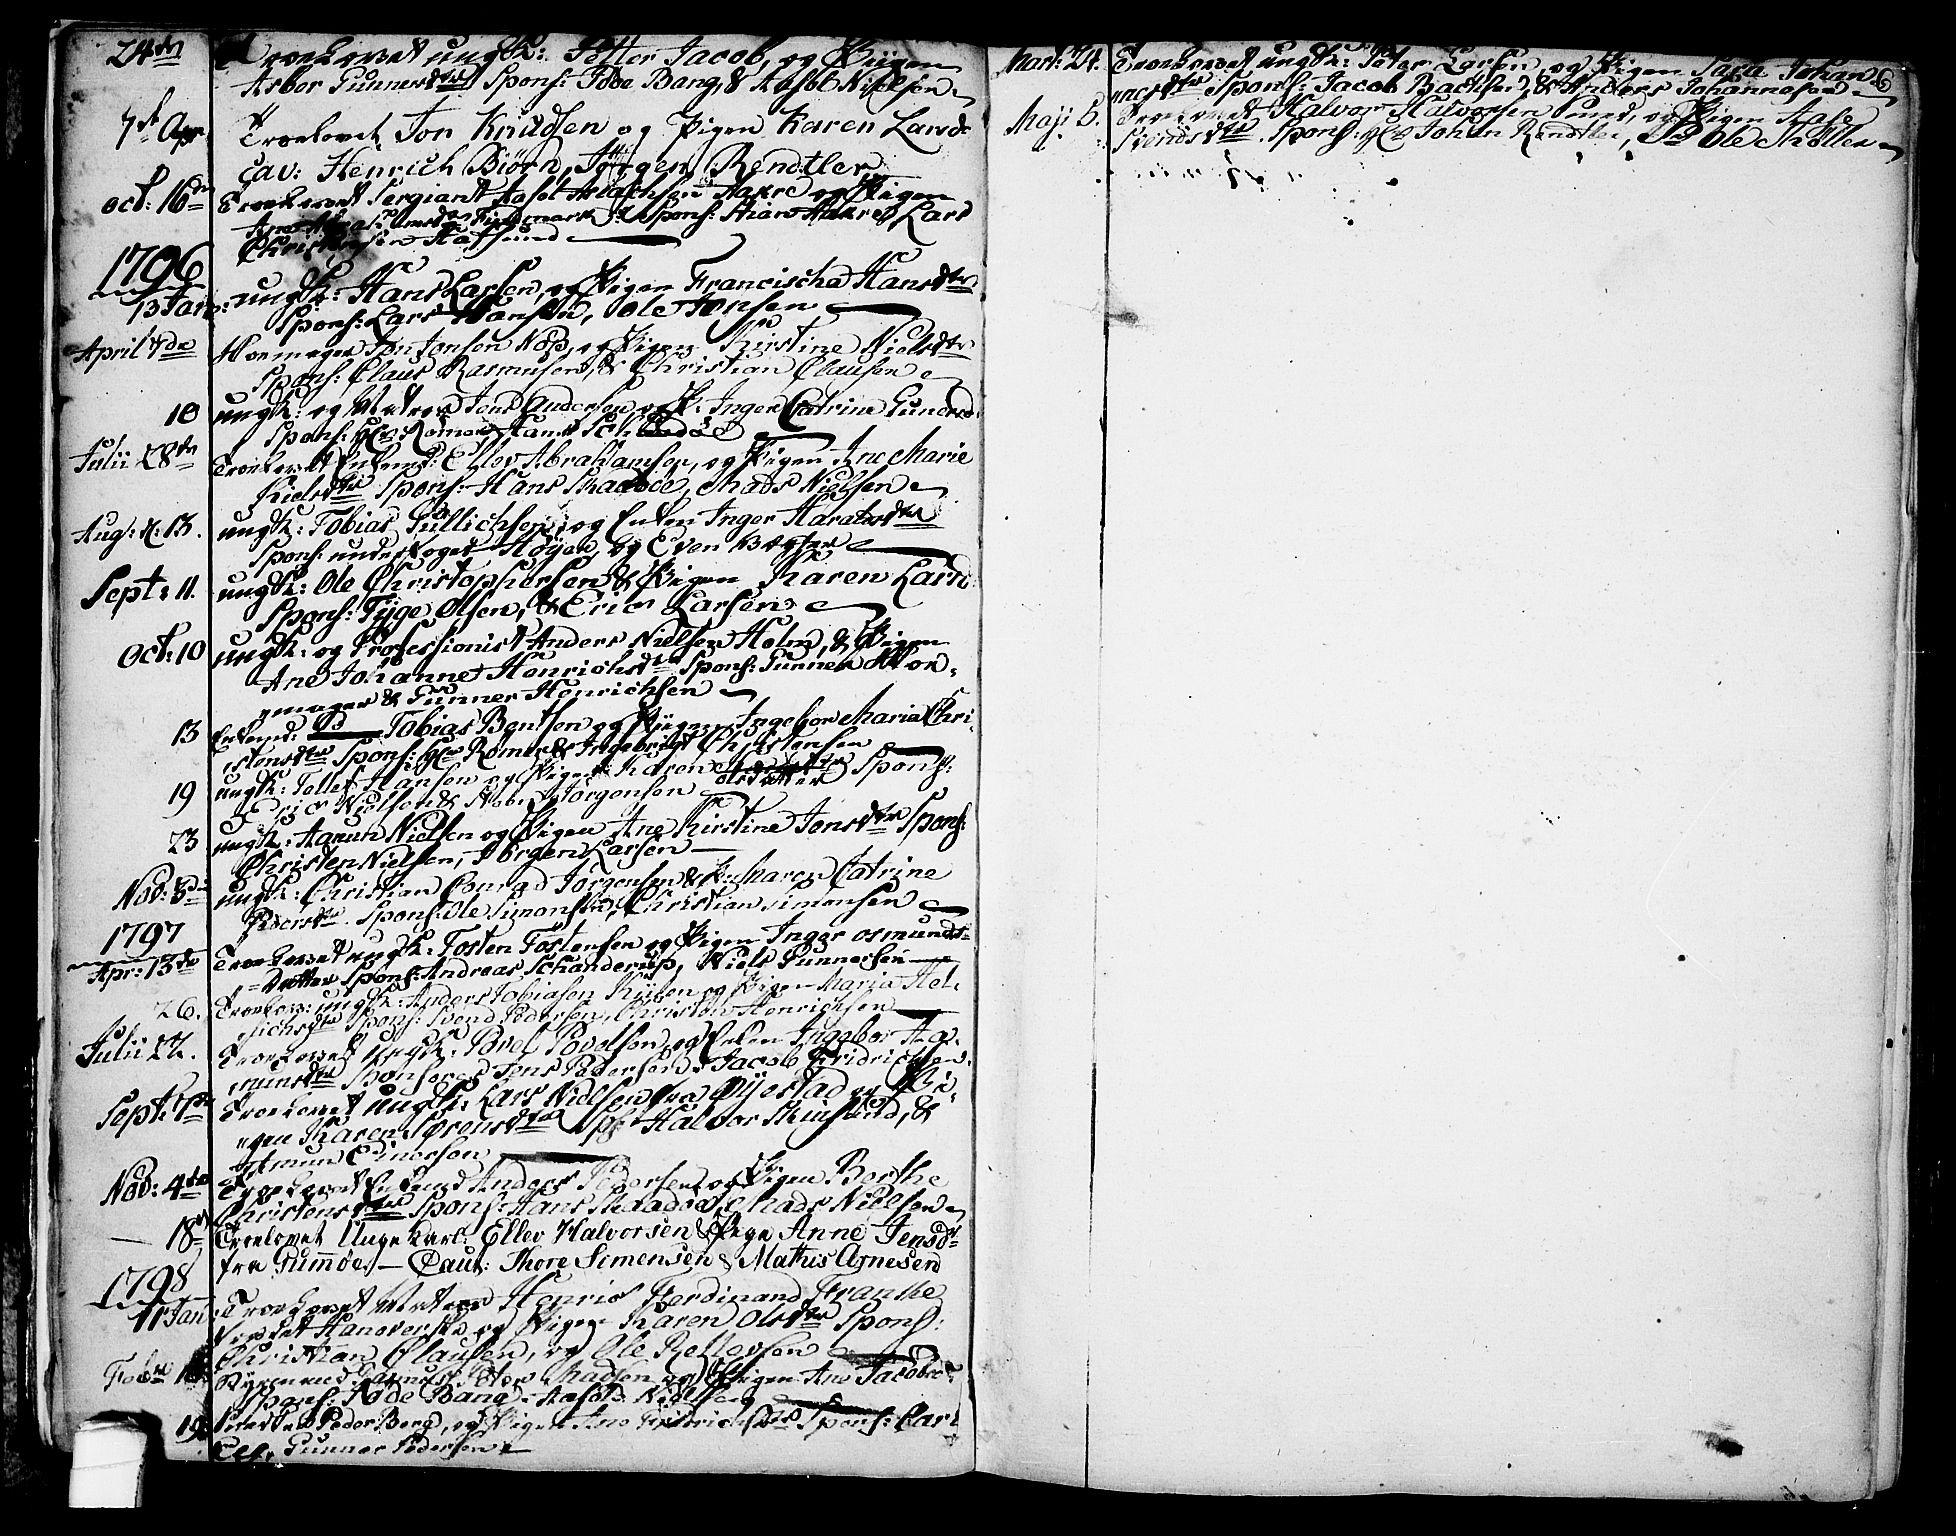 SAKO, Kragerø kirkebøker, F/Fa/L0002: Ministerialbok nr. 2, 1767-1802, s. 6